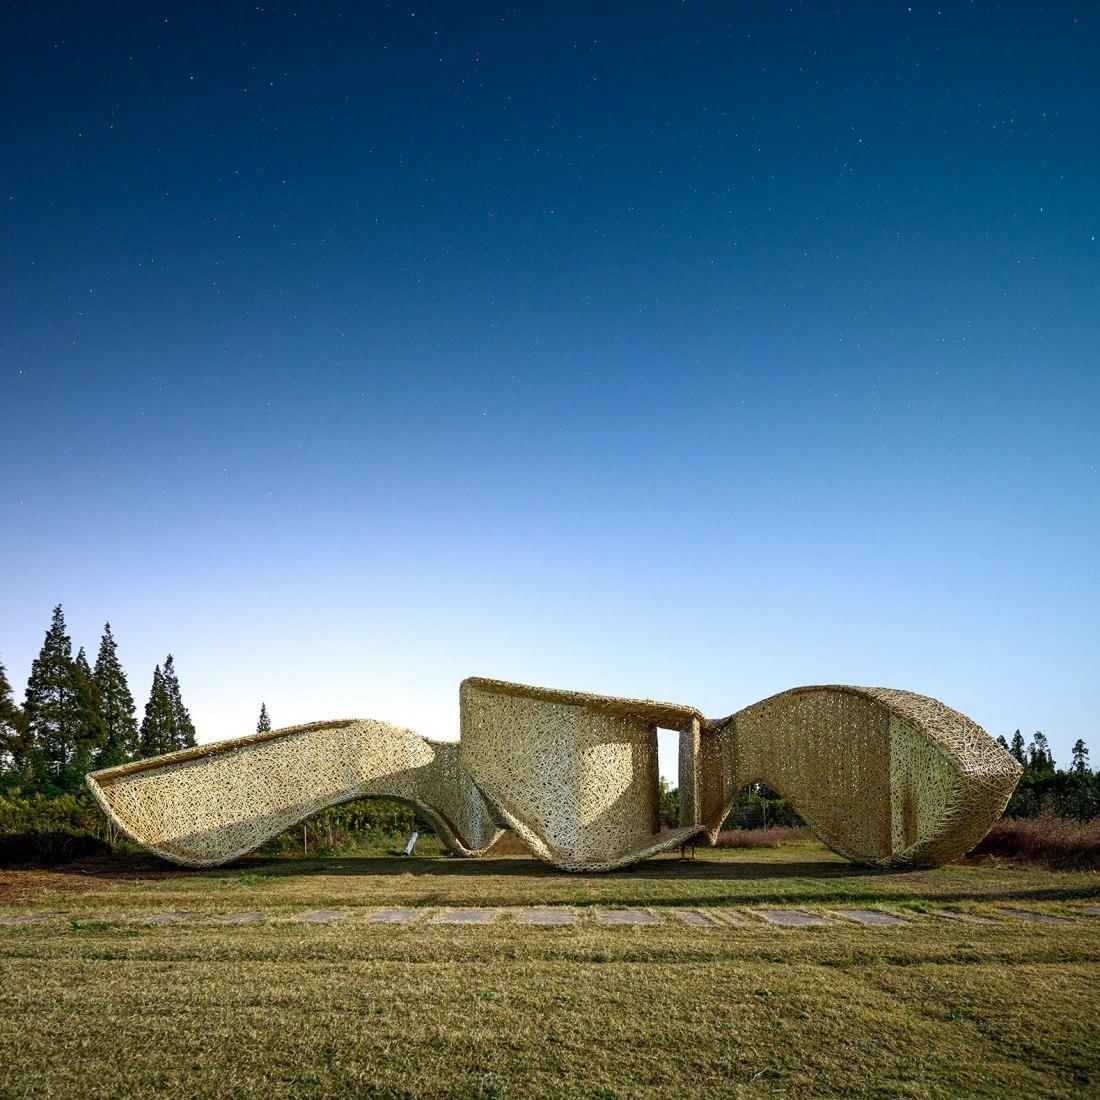 Bamboo Pavilion by LIN architecture. Photograph by Sunkai LIU.